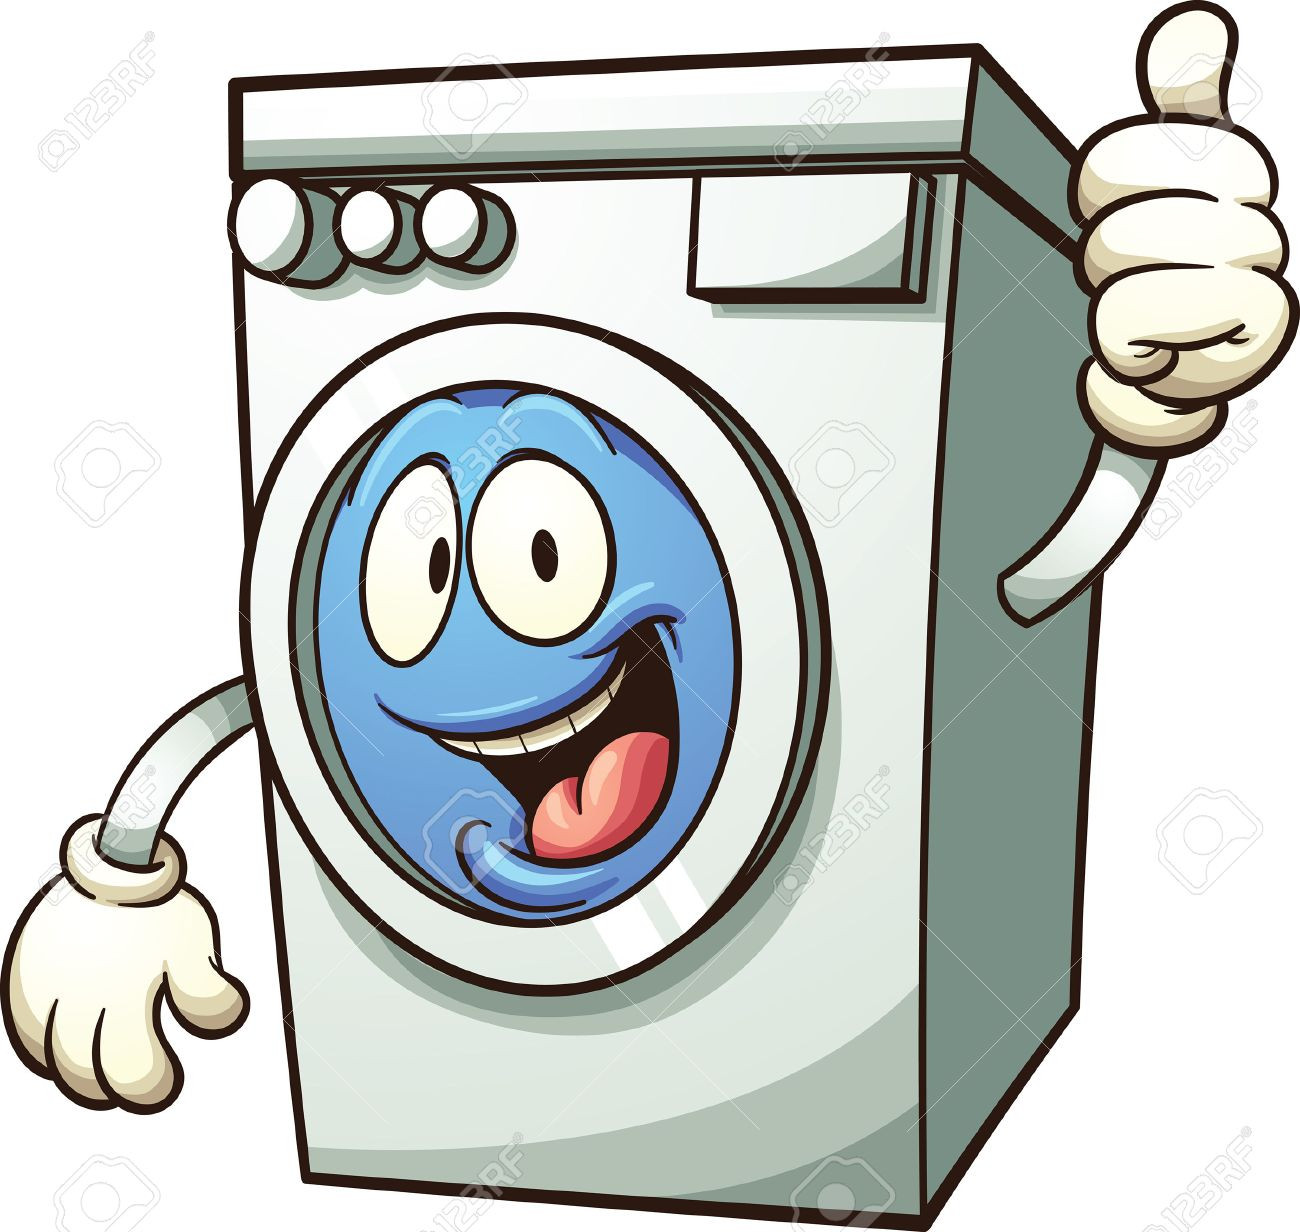 1300x1232 Cartoon Washing Machine Vector Clip Art Illustration With Simple